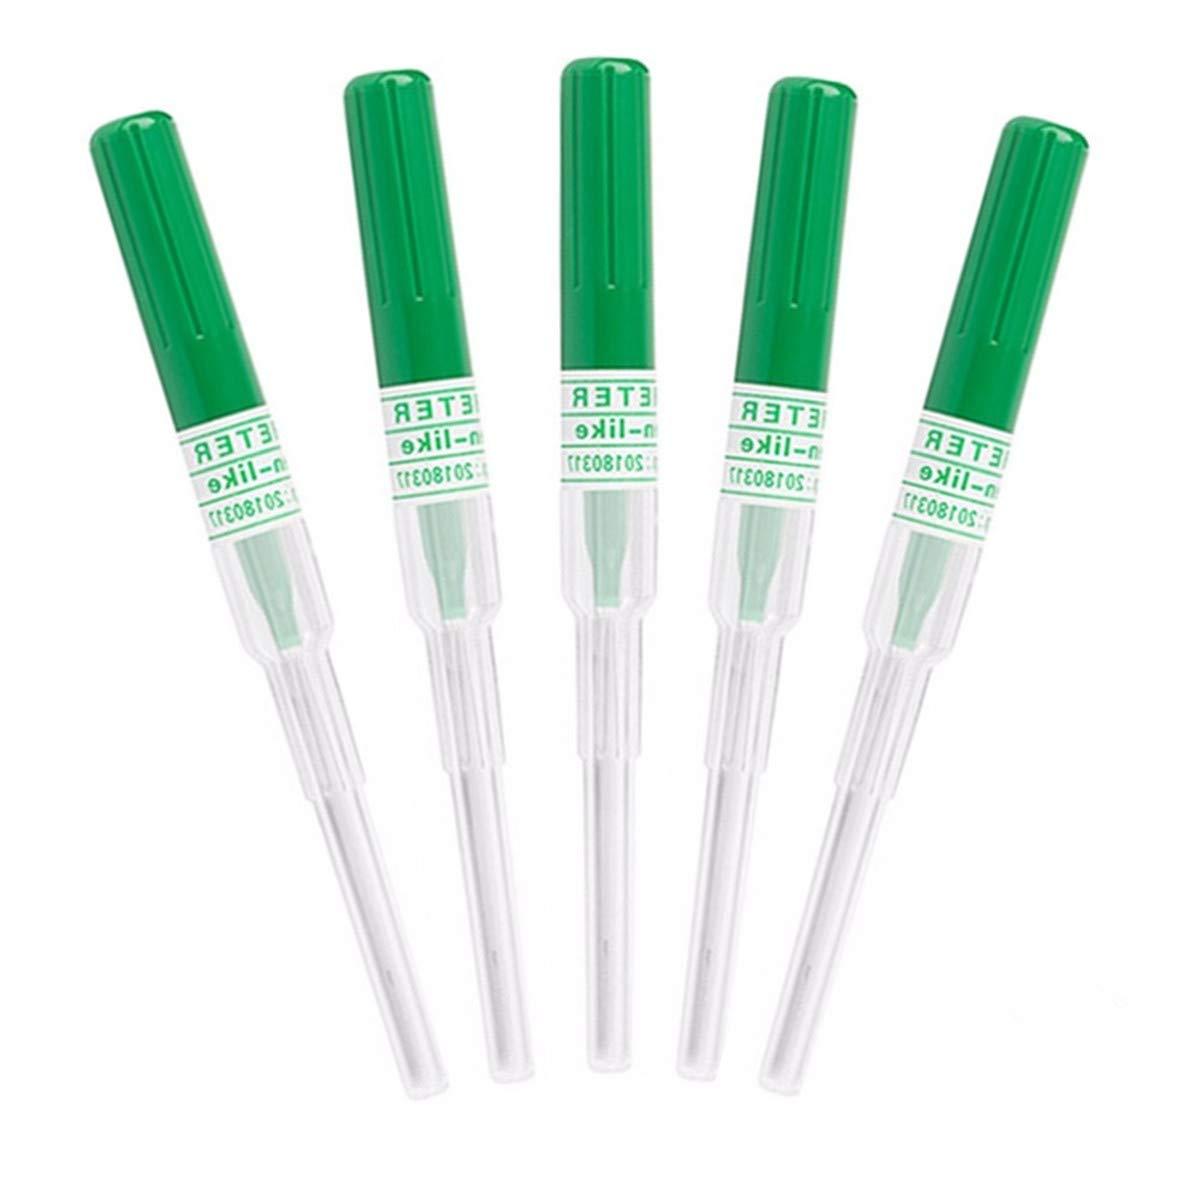 Ear Nose Piercing Needles - Need Popular overseas 18 Price reduction Gauge Yuelong 50PCS